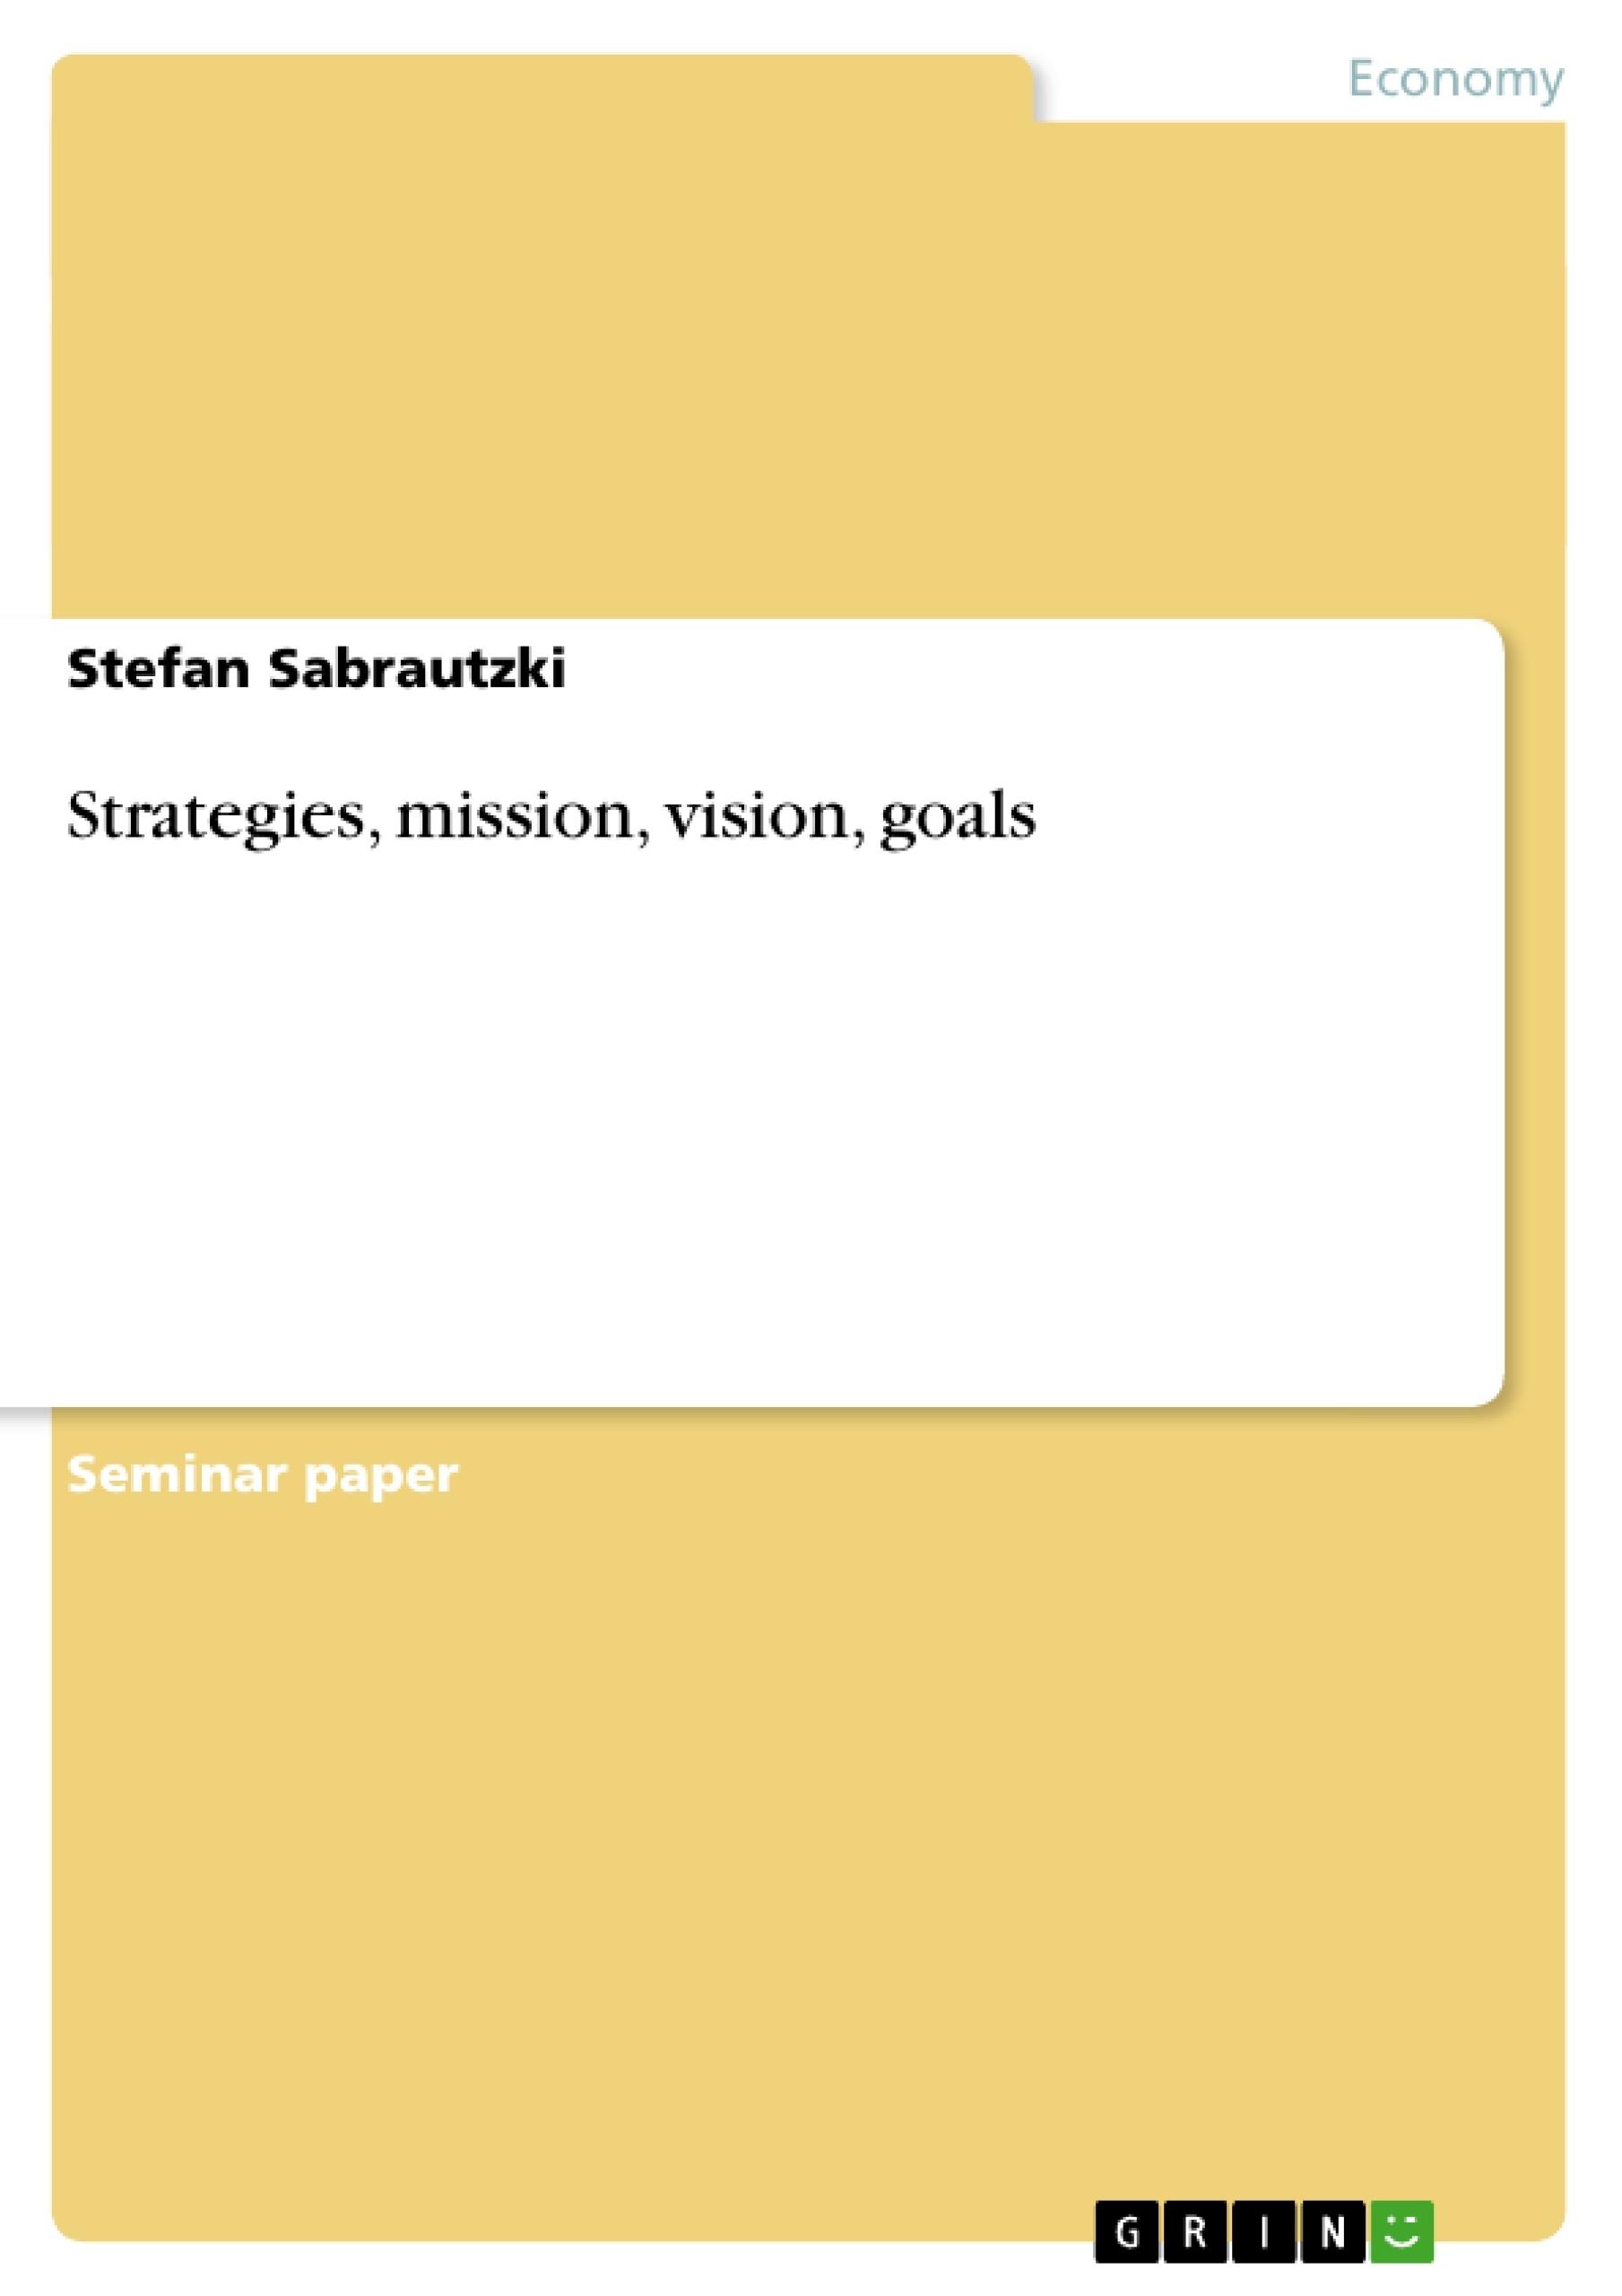 Title: Strategies, mission, vision, goals